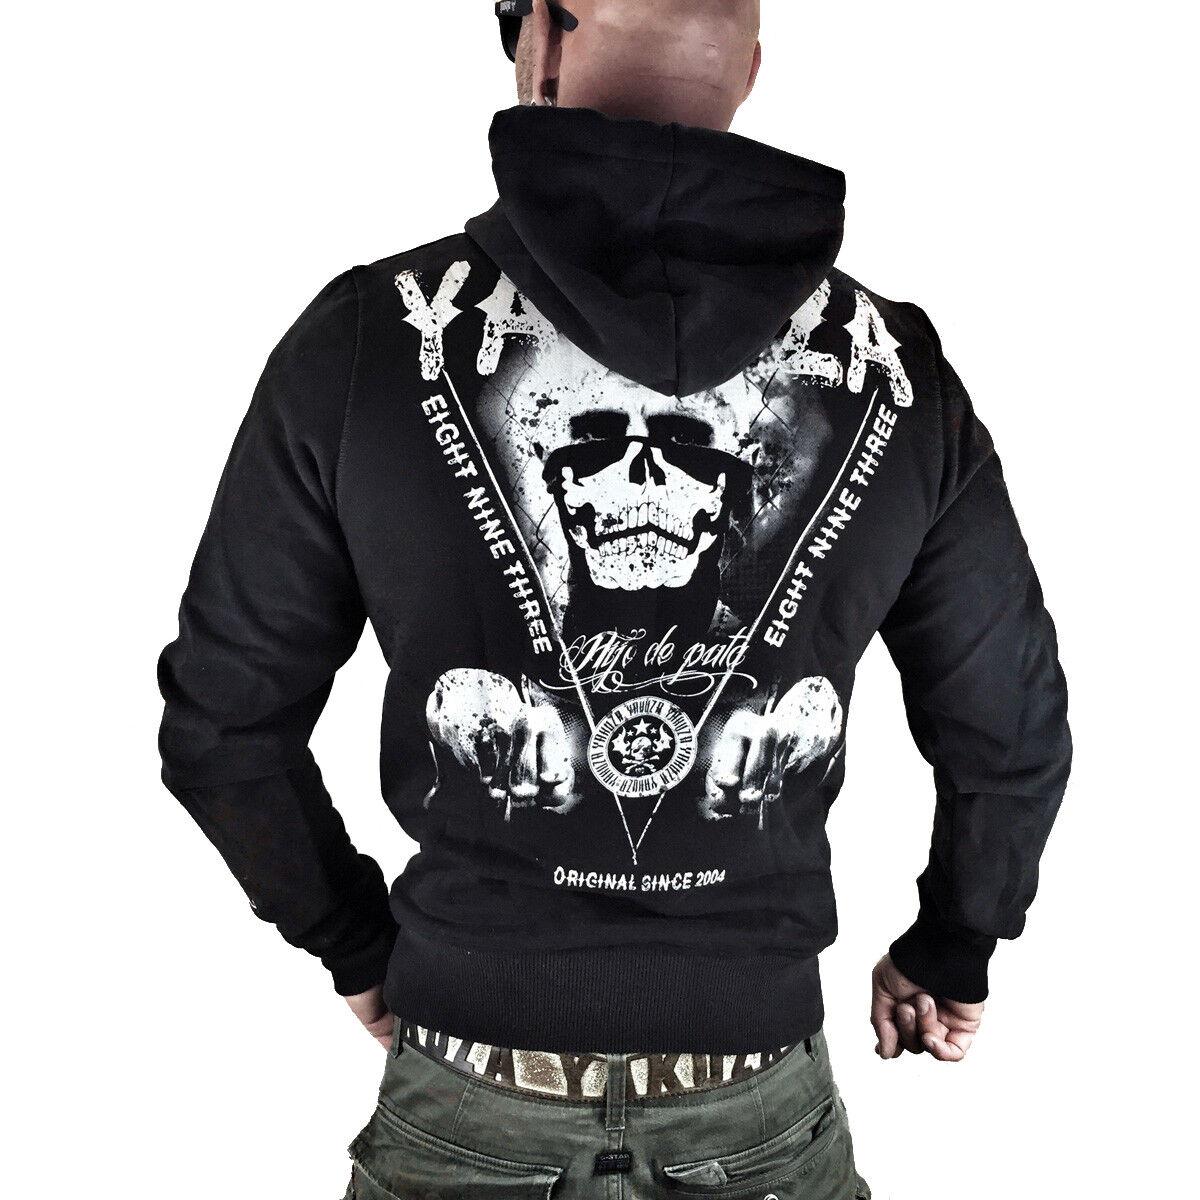 YAKUZA - Herren Hoodie HOB 7023  Mexican  schwarz (schwarz)